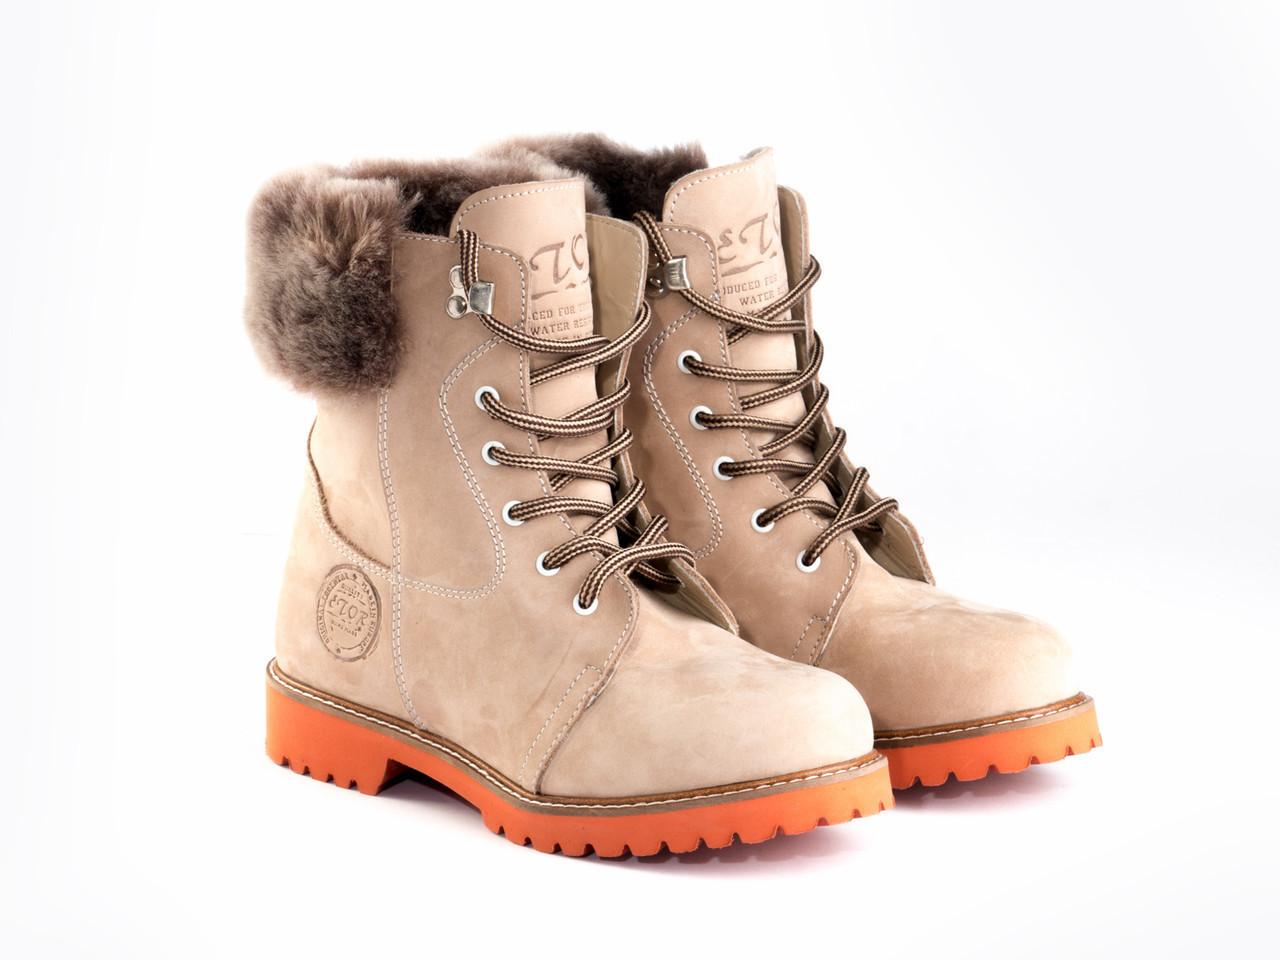 Ботинки Etor 6419-2298-832 40 бежевые